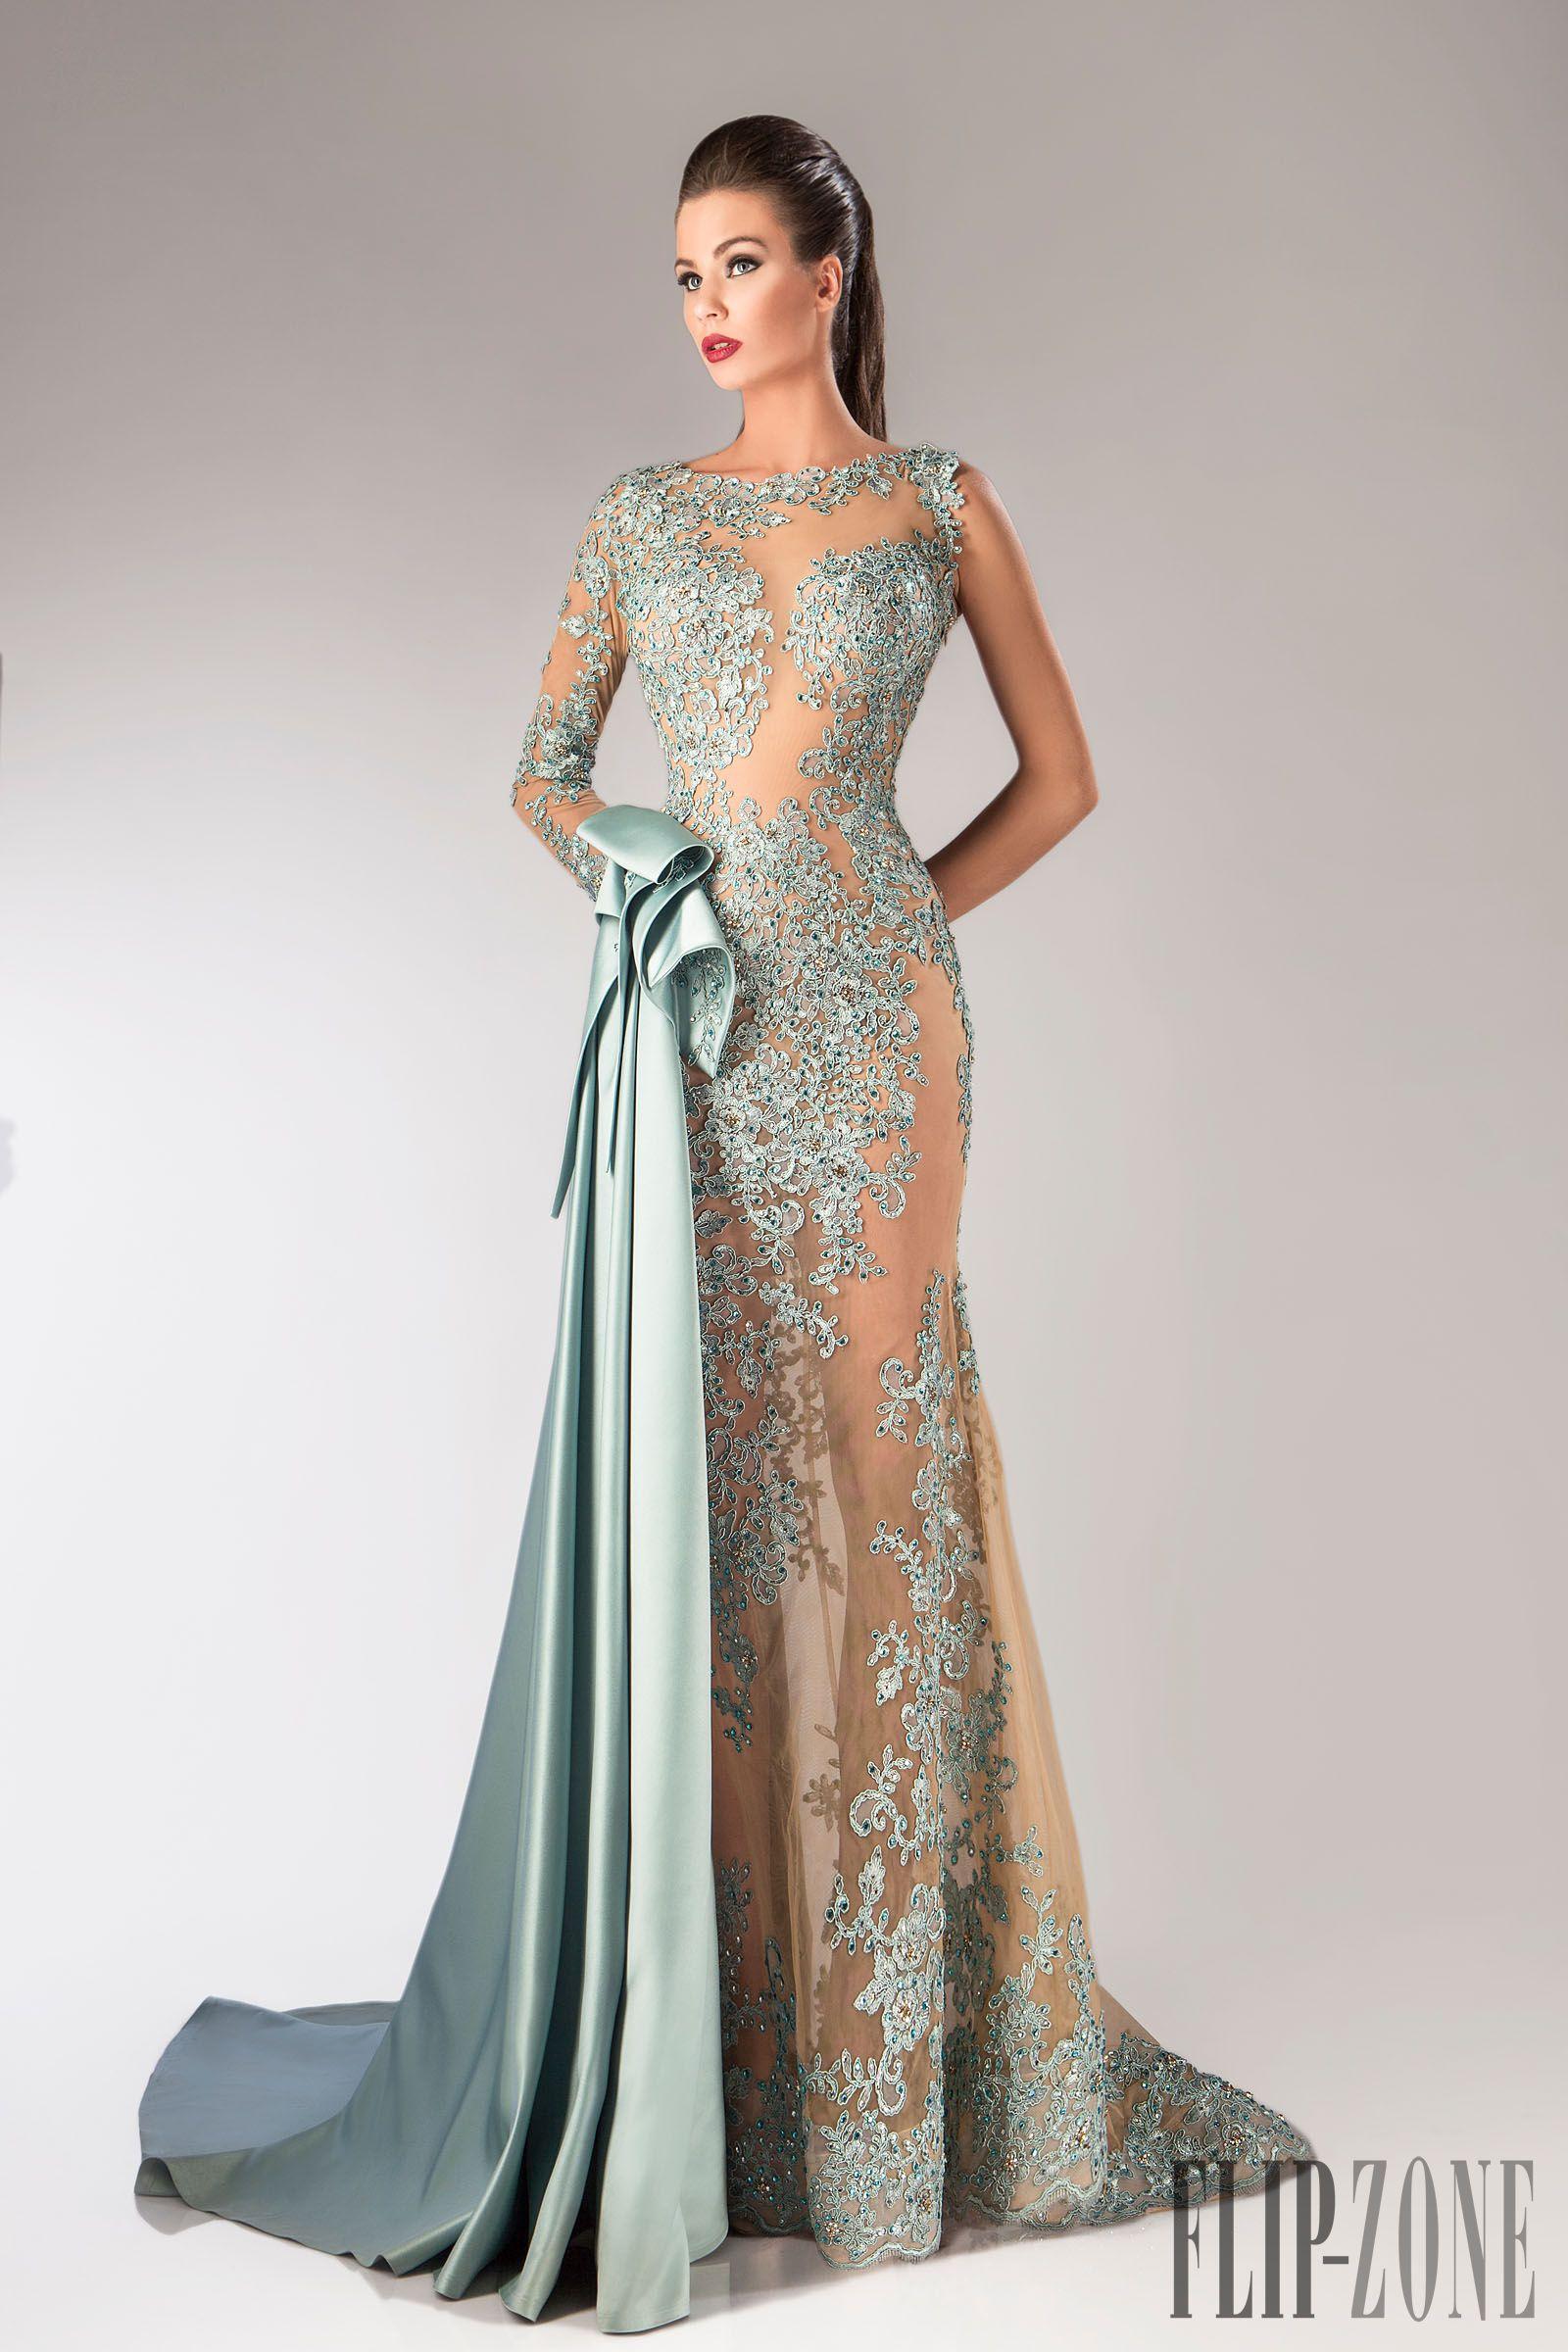 Hanna Toumajean Fall-winter 2014-2015 - Couture - http://www.flip-zone.net/fashion/couture-1/independant-designers/hanna-toumajean-5031